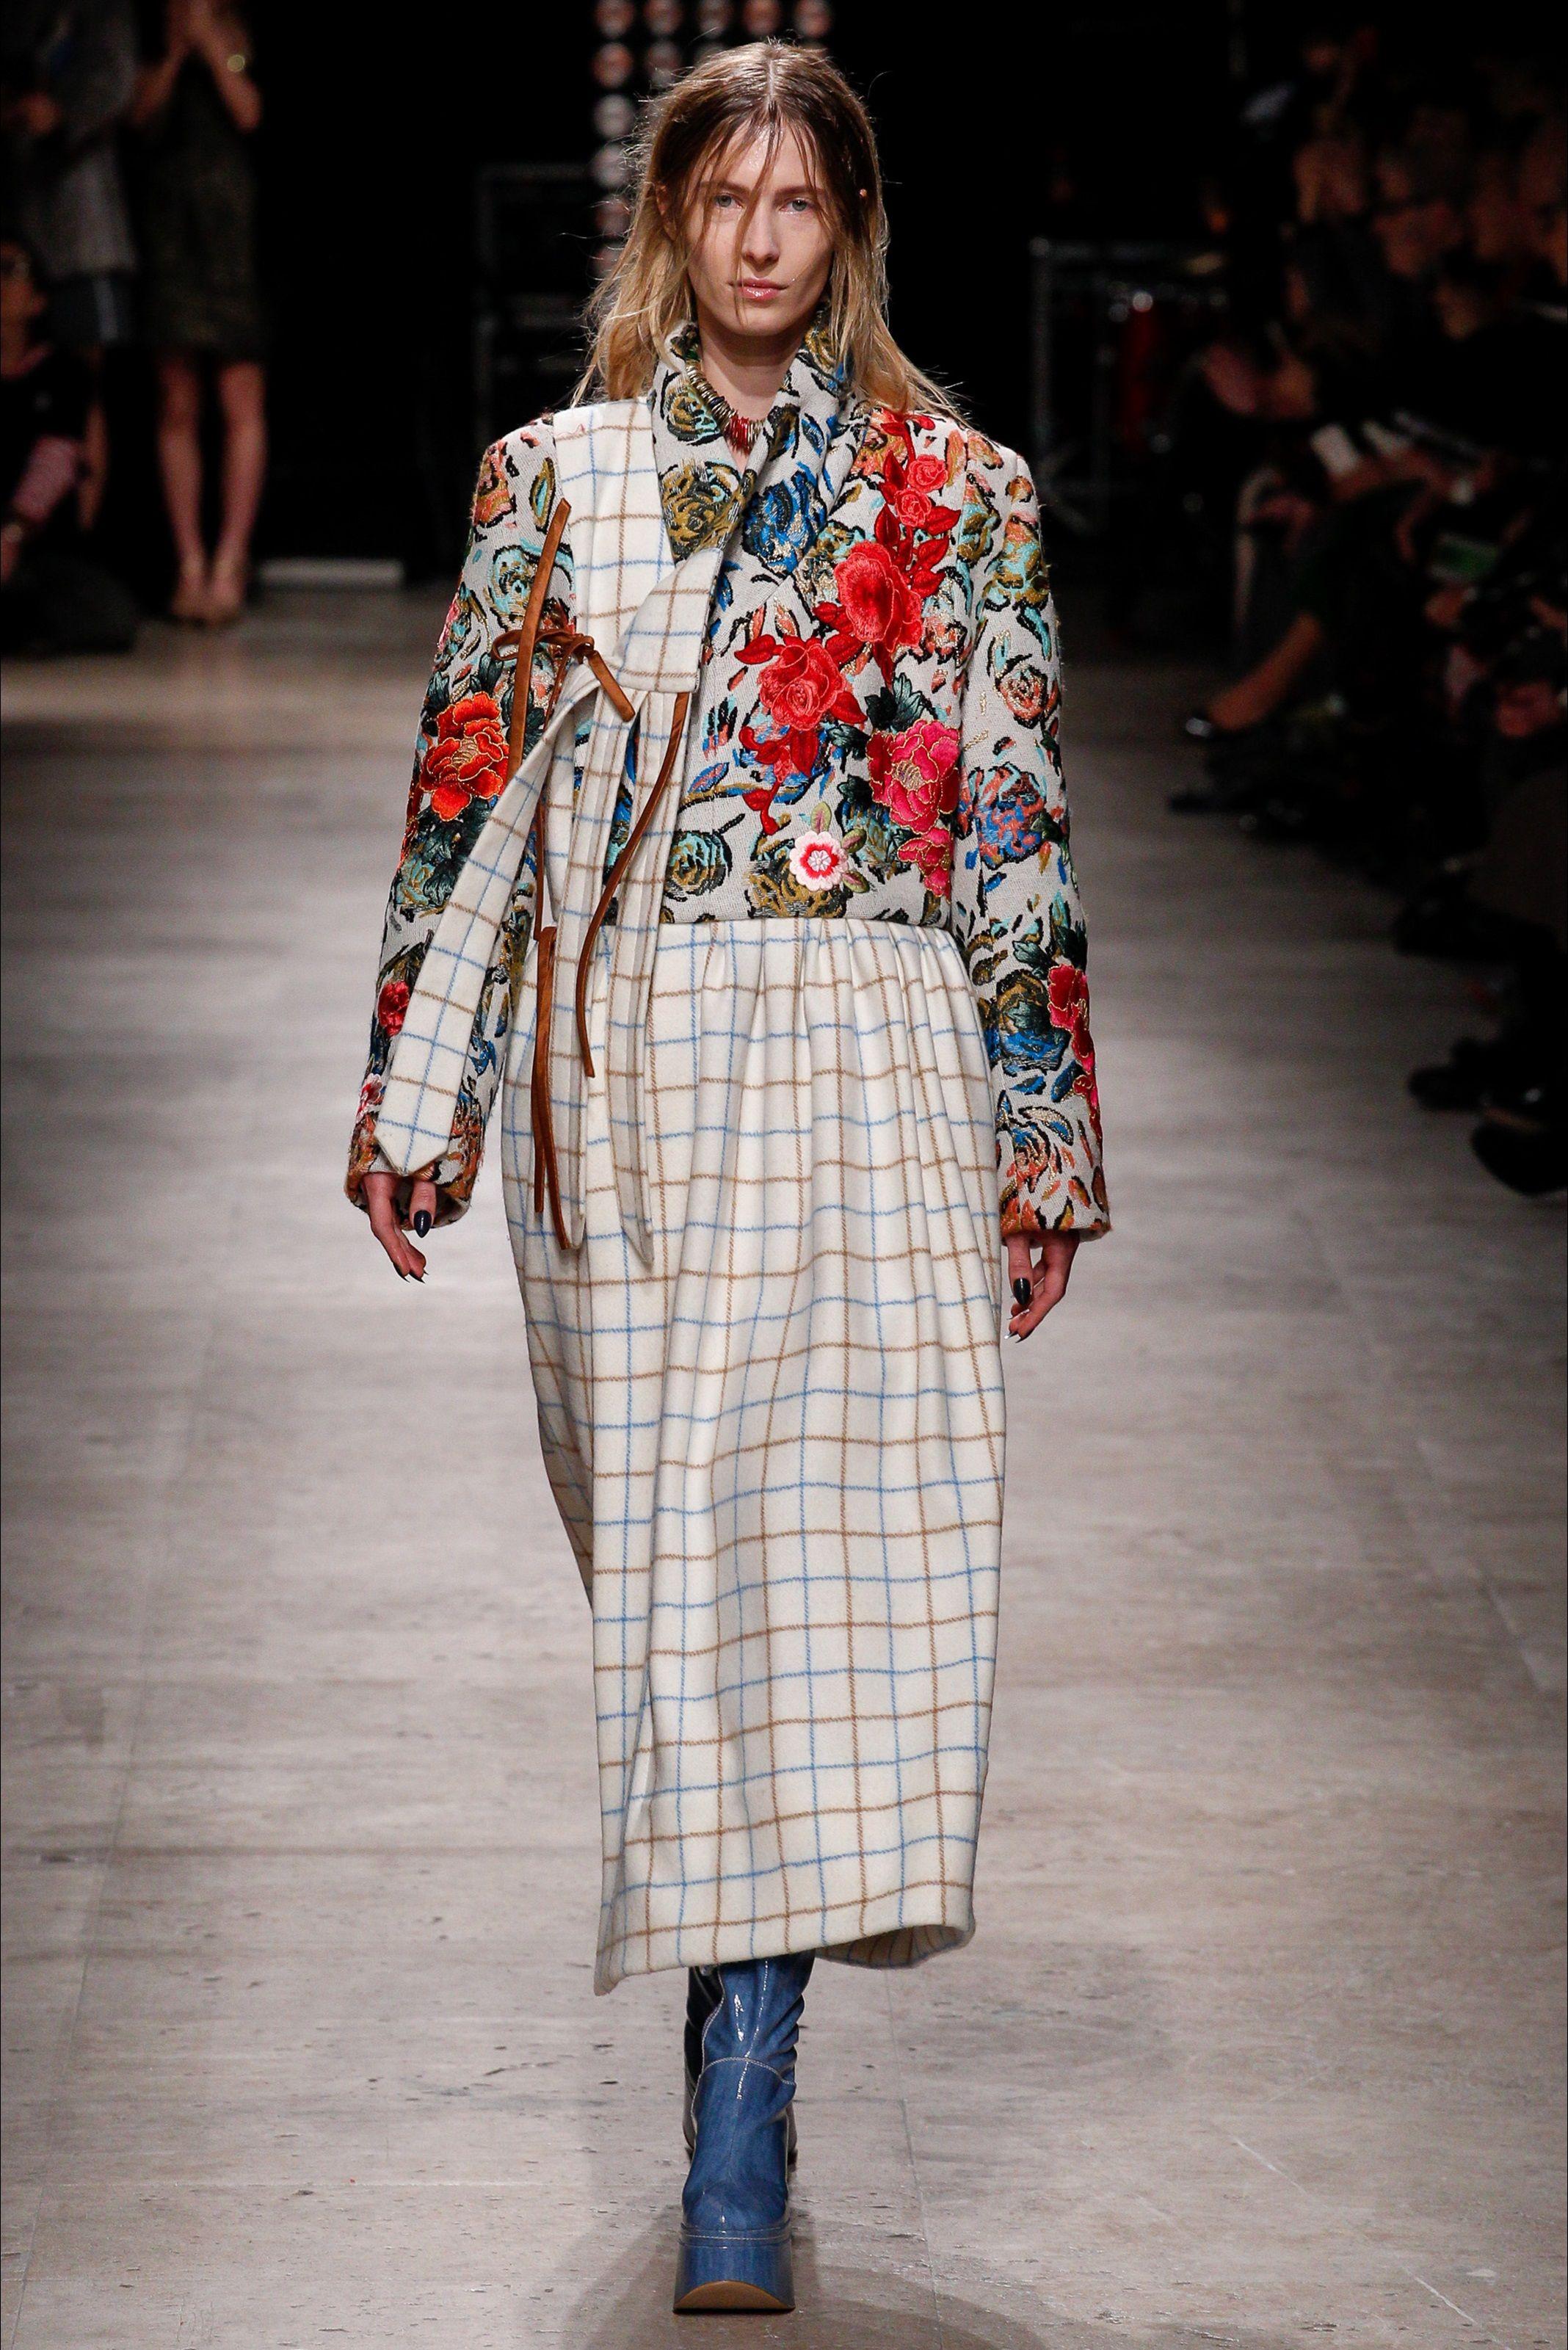 Sfilata Andreas Kronthaler for Vivienne Westwood Parigi - Collezioni Autunno  Inverno 2016-17 - Vogue 519d1b76605